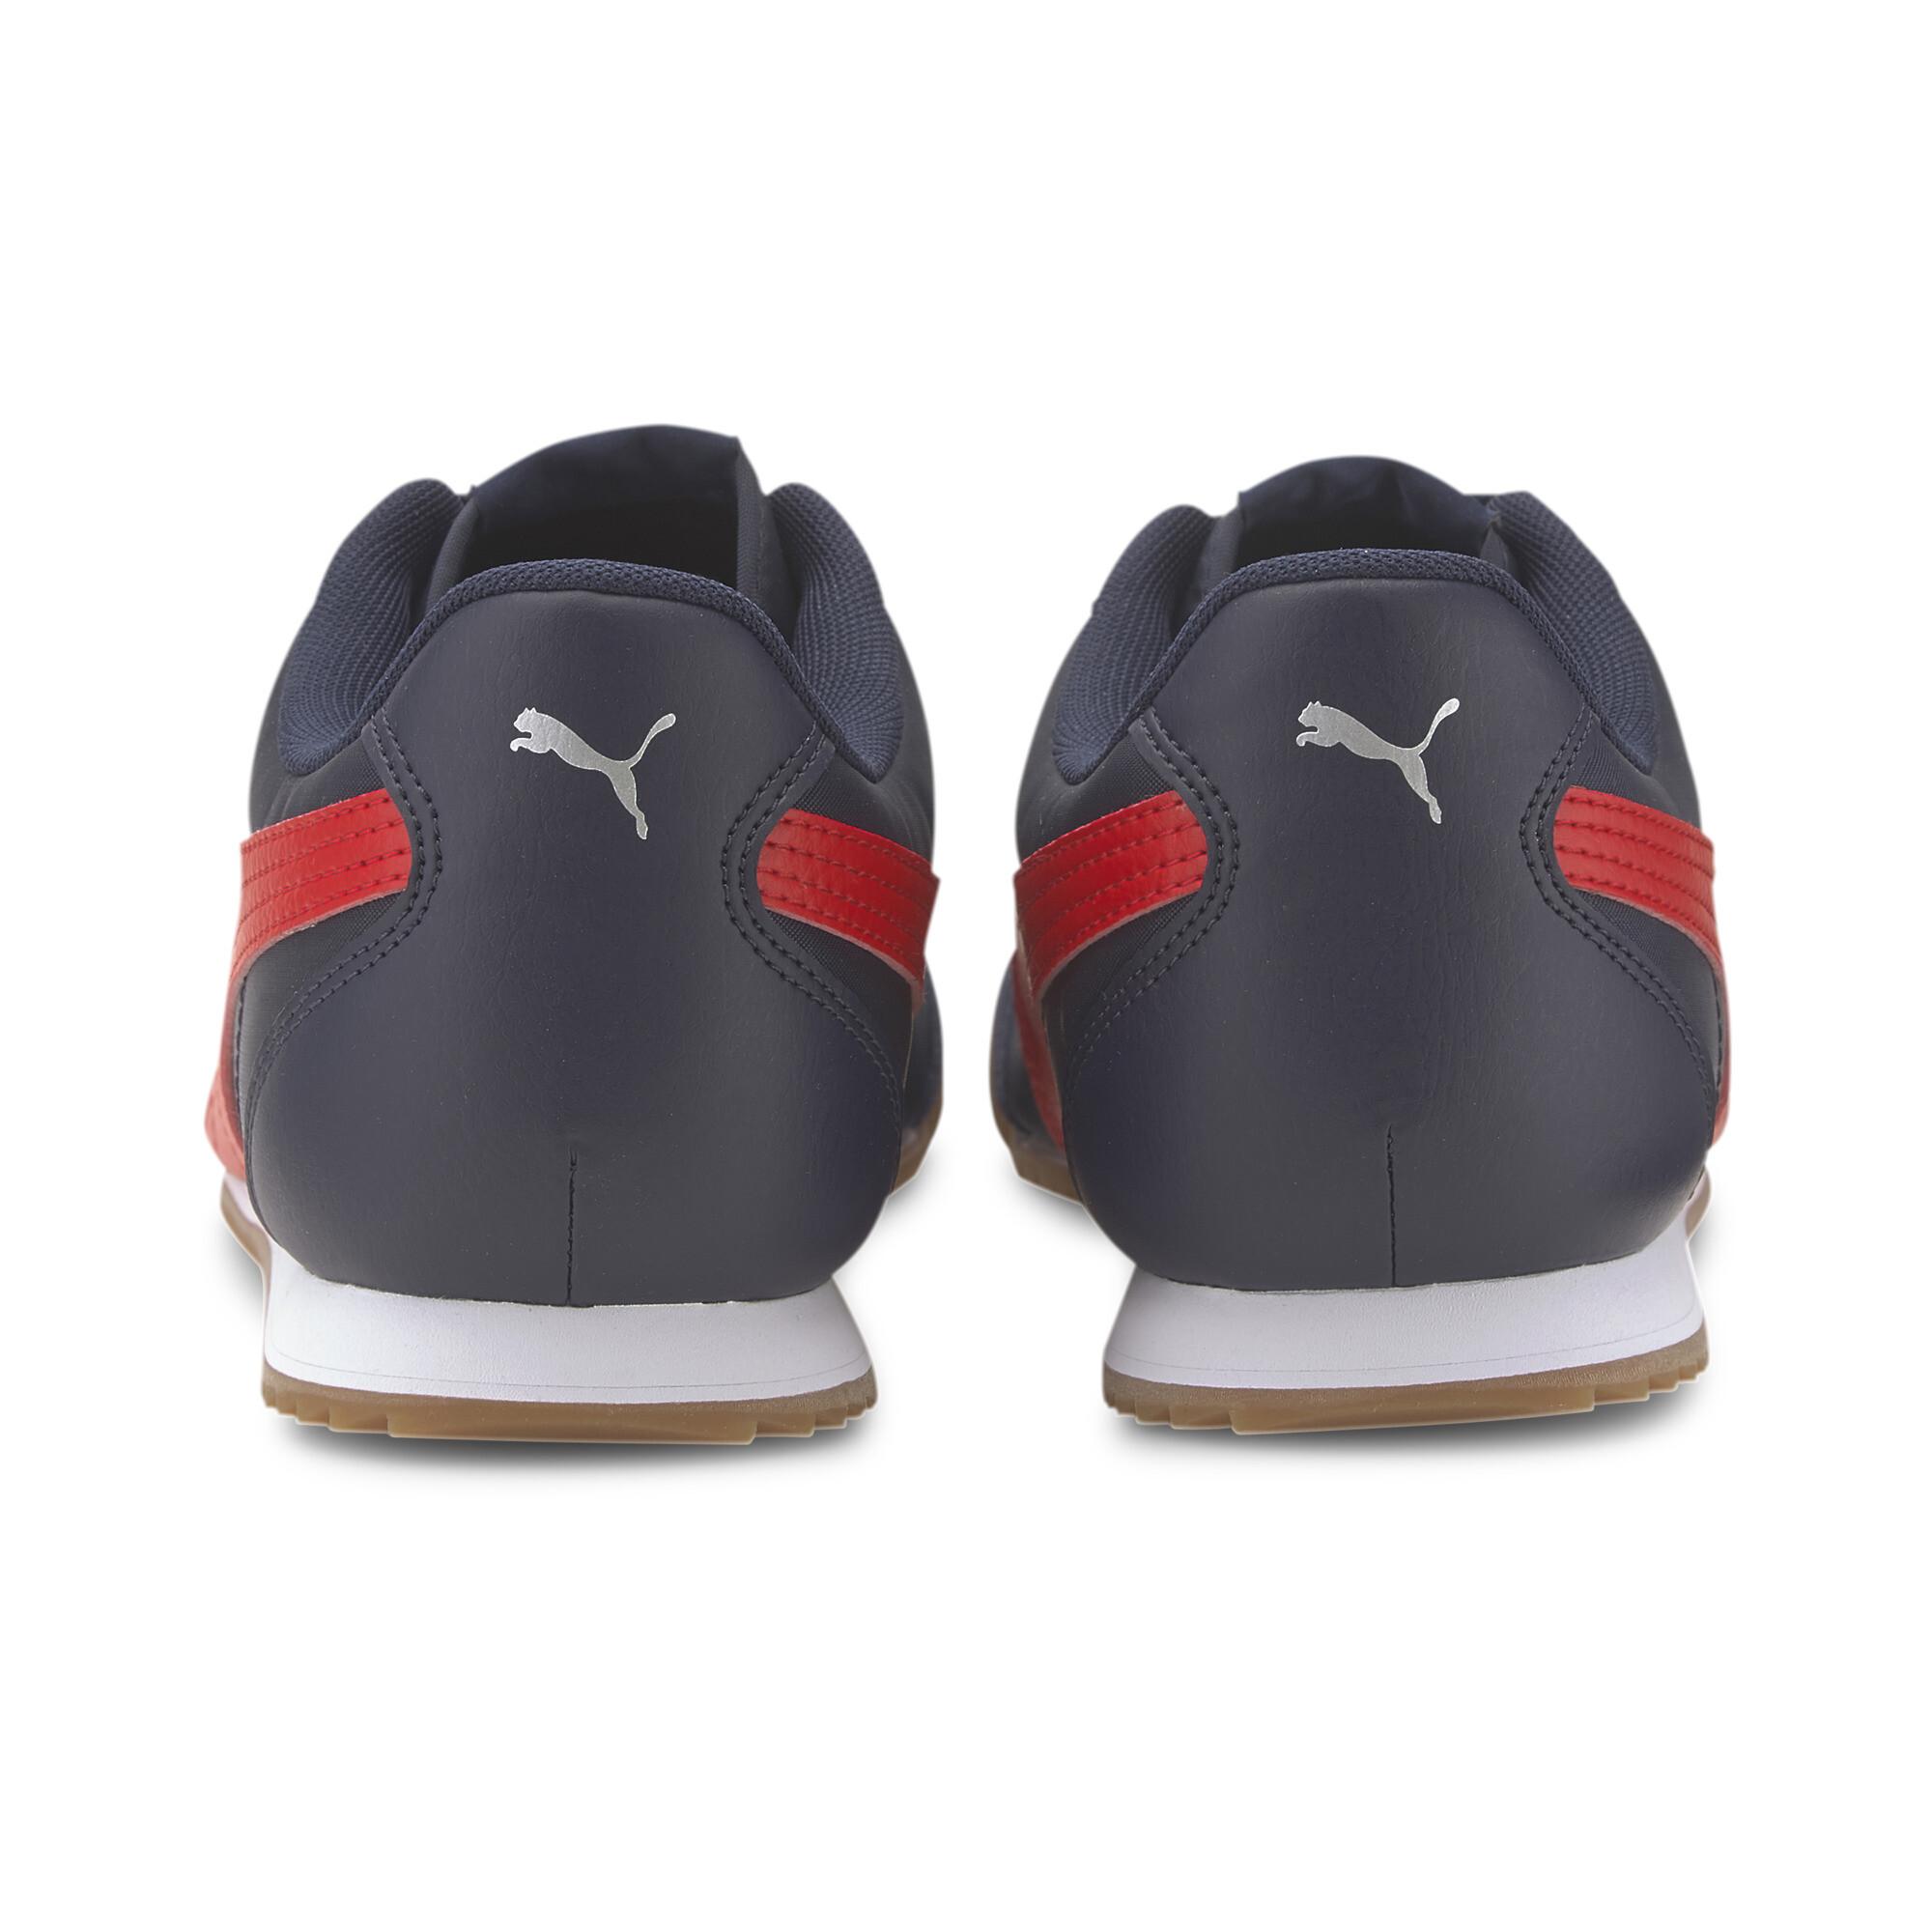 PUMA-Men-039-s-Turino-NL-Sneakers thumbnail 10